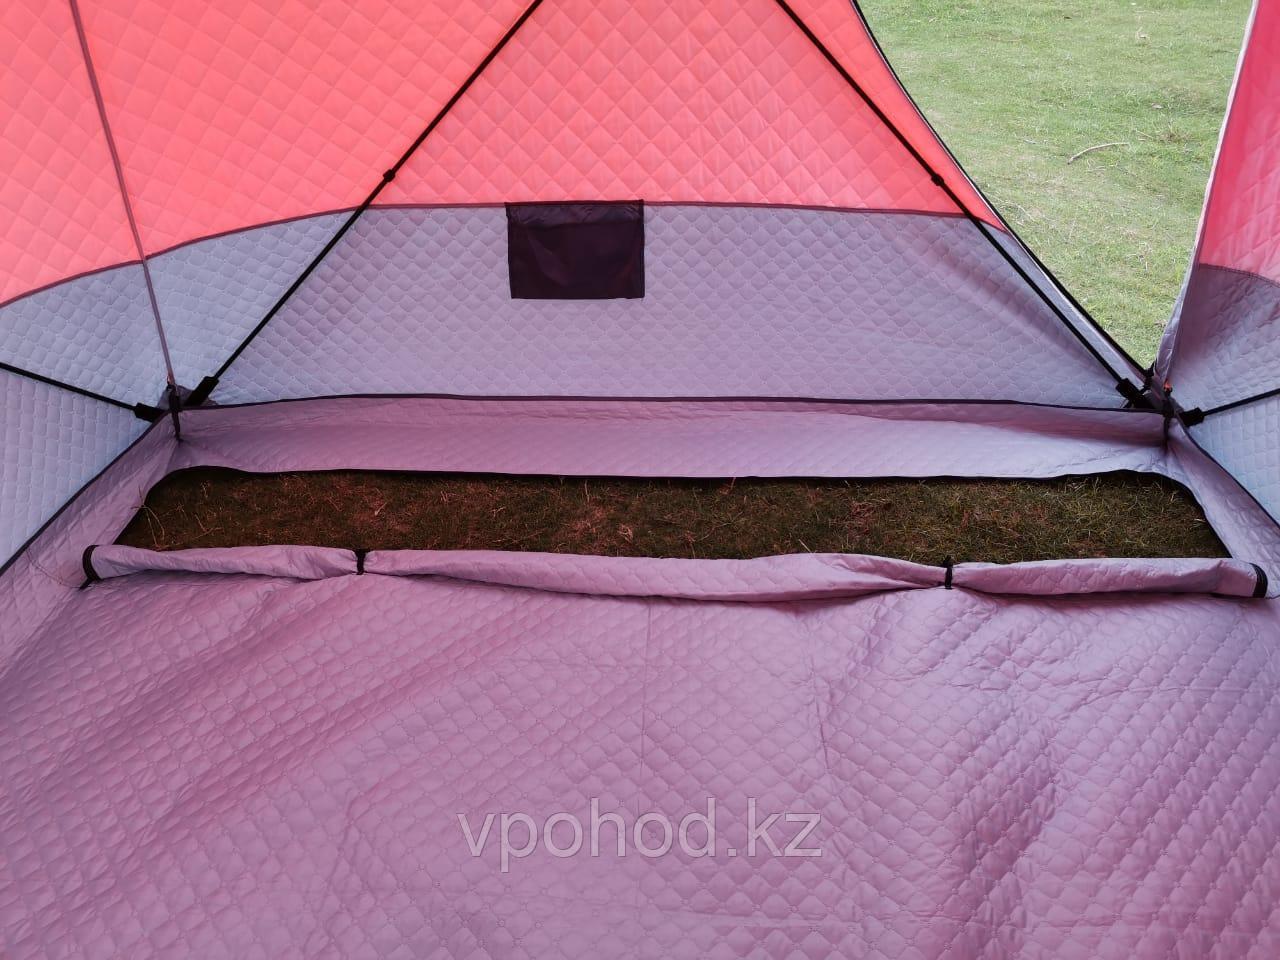 Пол для палатки Mimir 2017